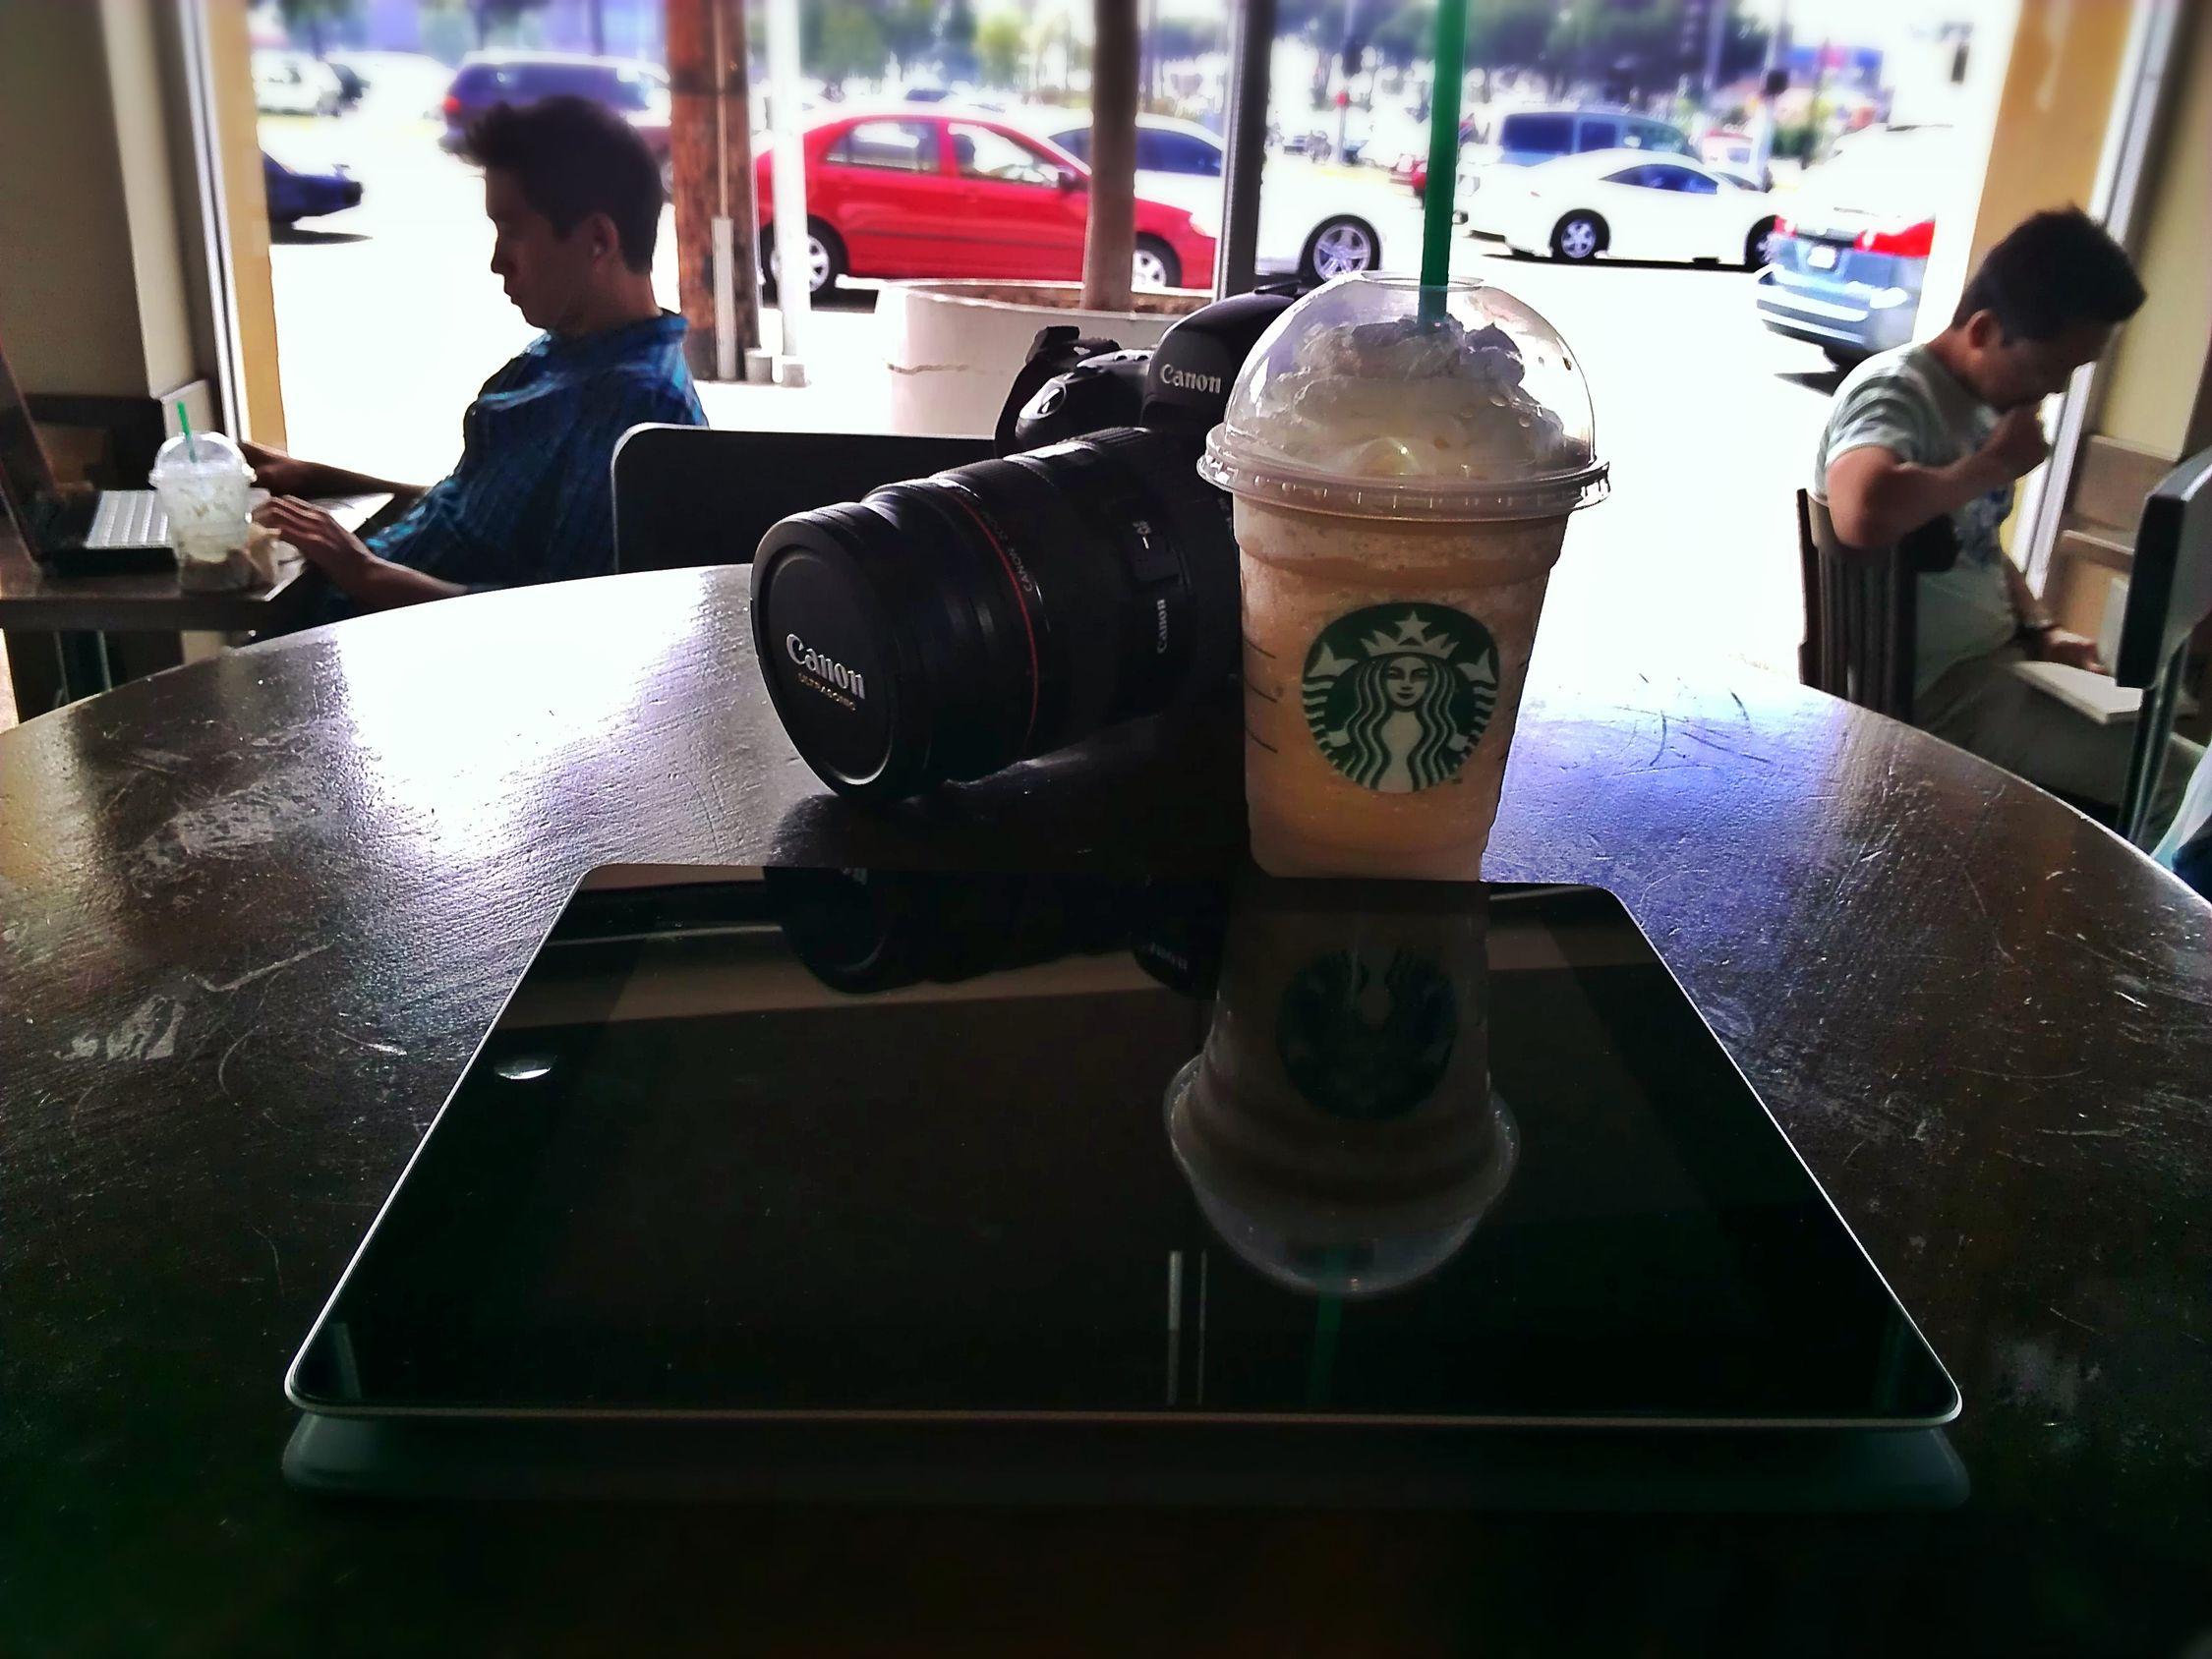 Start up Canon Coffee Shop Ipad Canon 5d